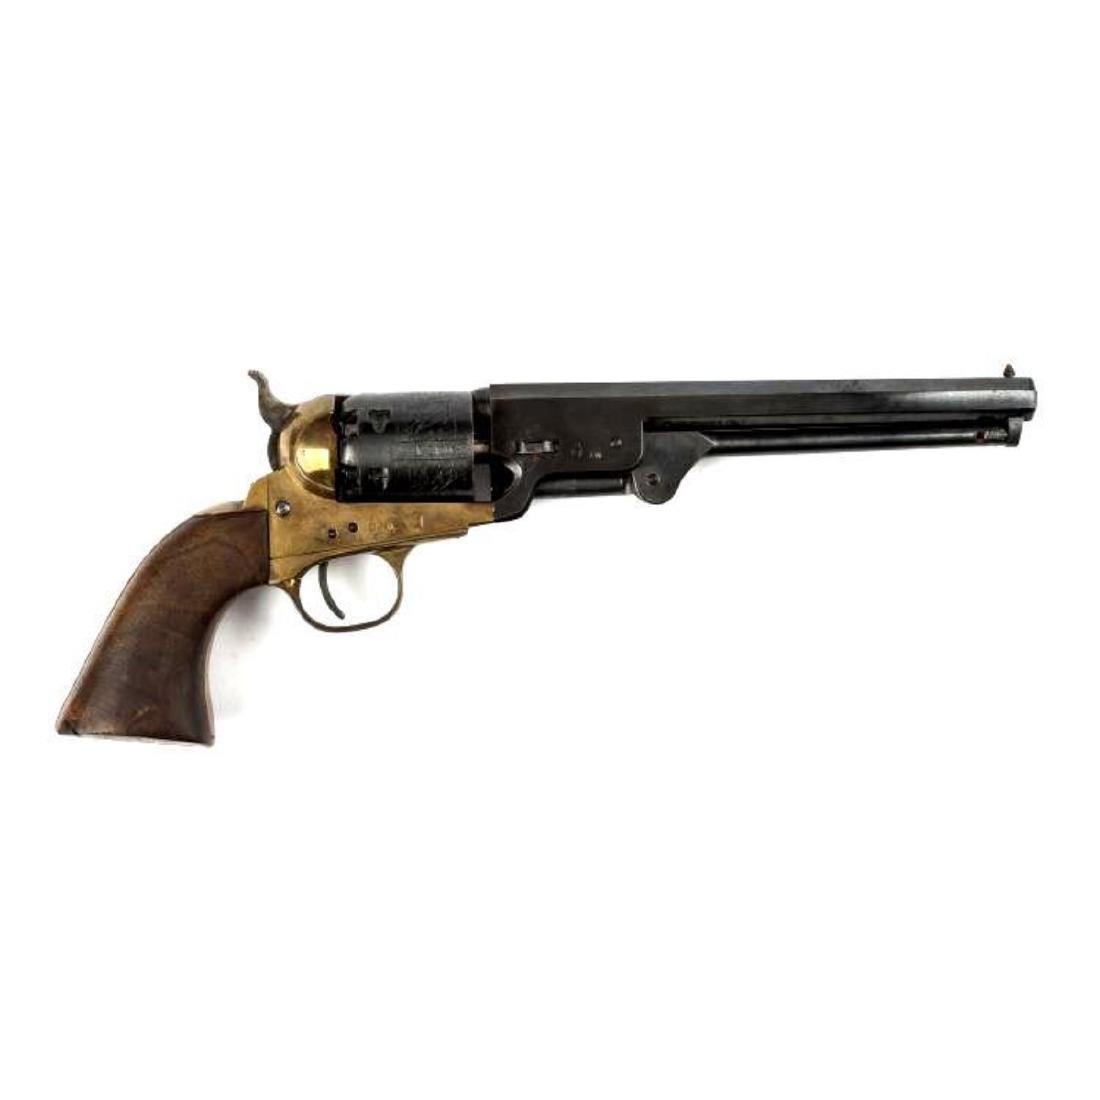 Italian Replica 1851 Navy Revolver - .36 Cal - 5